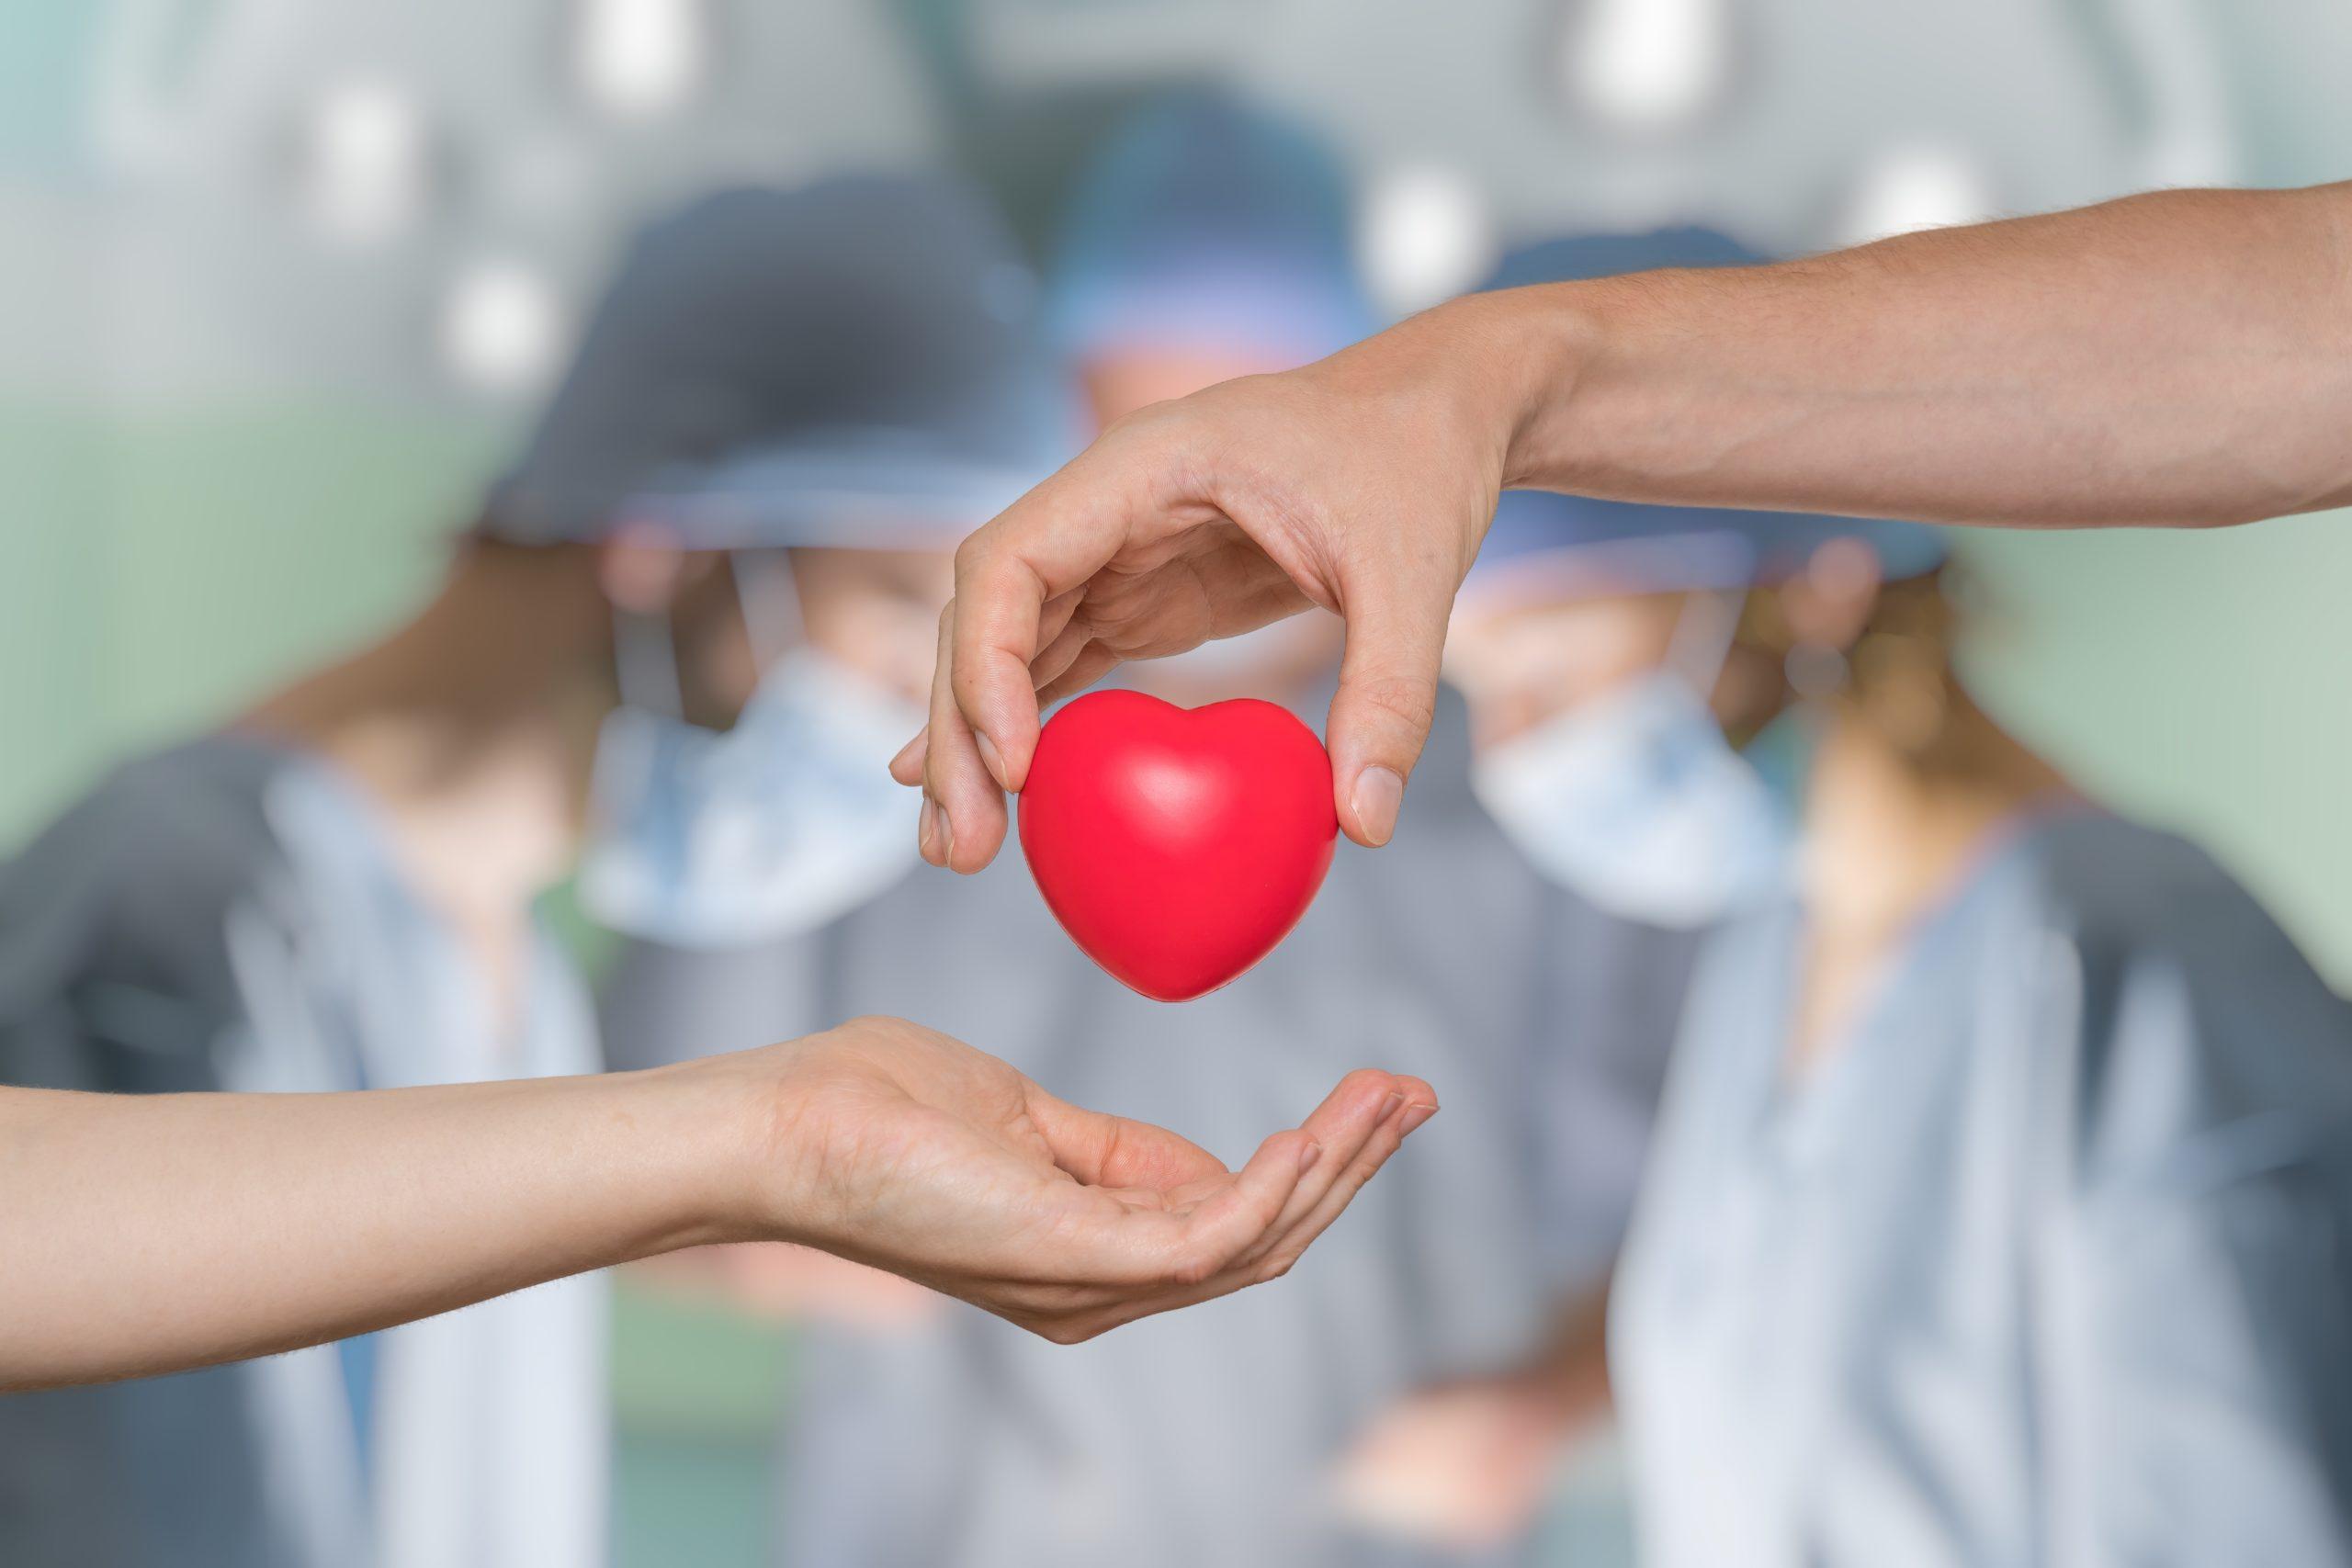 Should conscription of organs after death be mandatory?